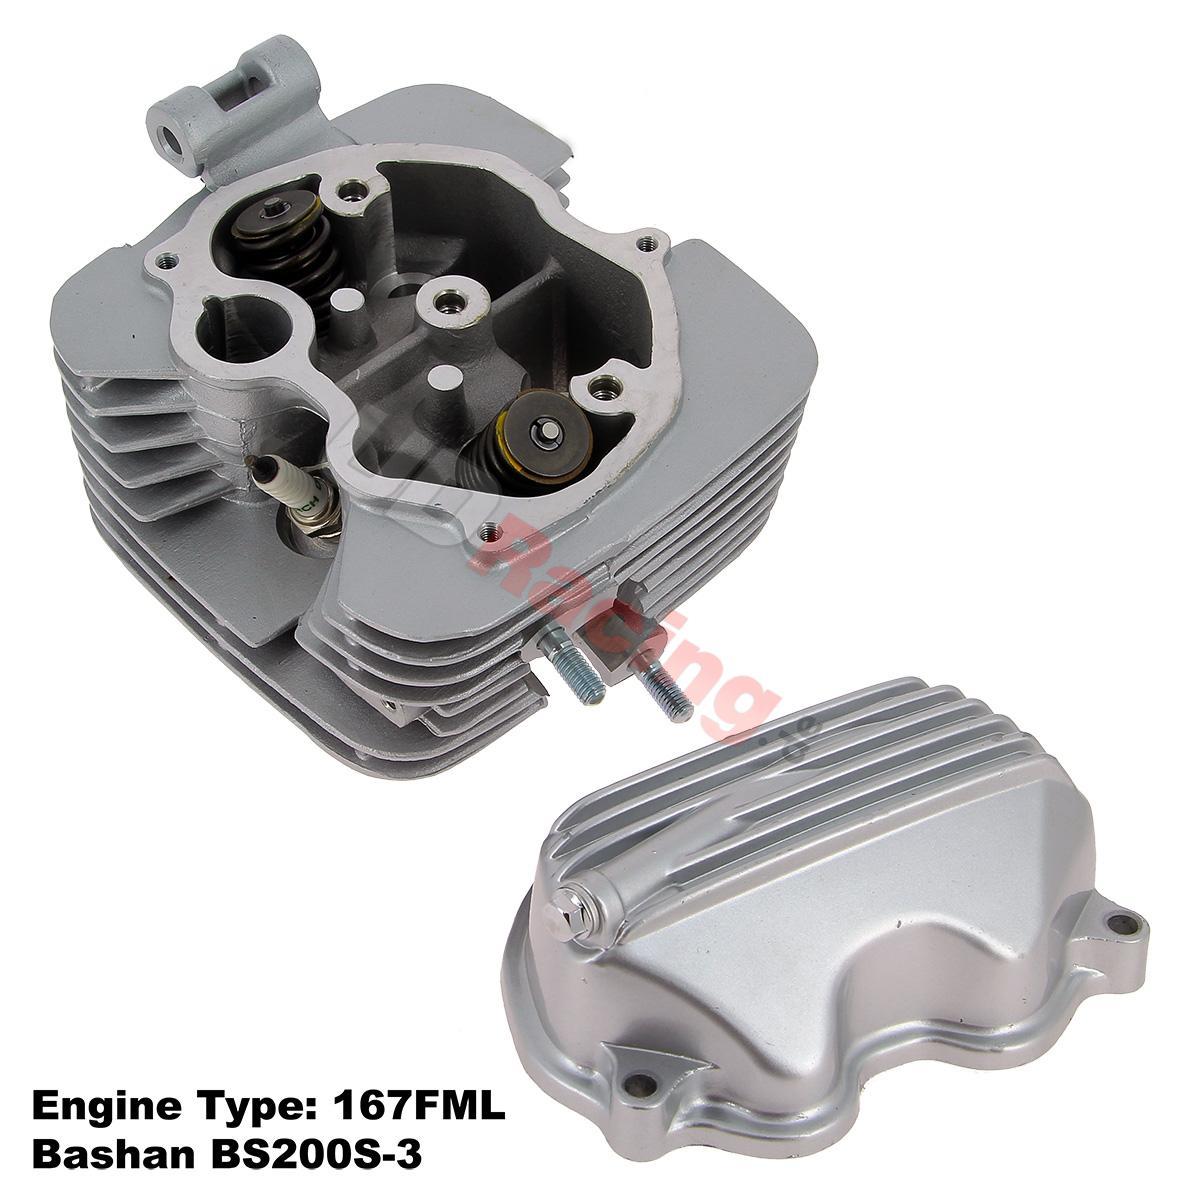 Zylinderkopf komplett für Quad Bashan 200ccm BS200S-3, Motor, Bashan ...